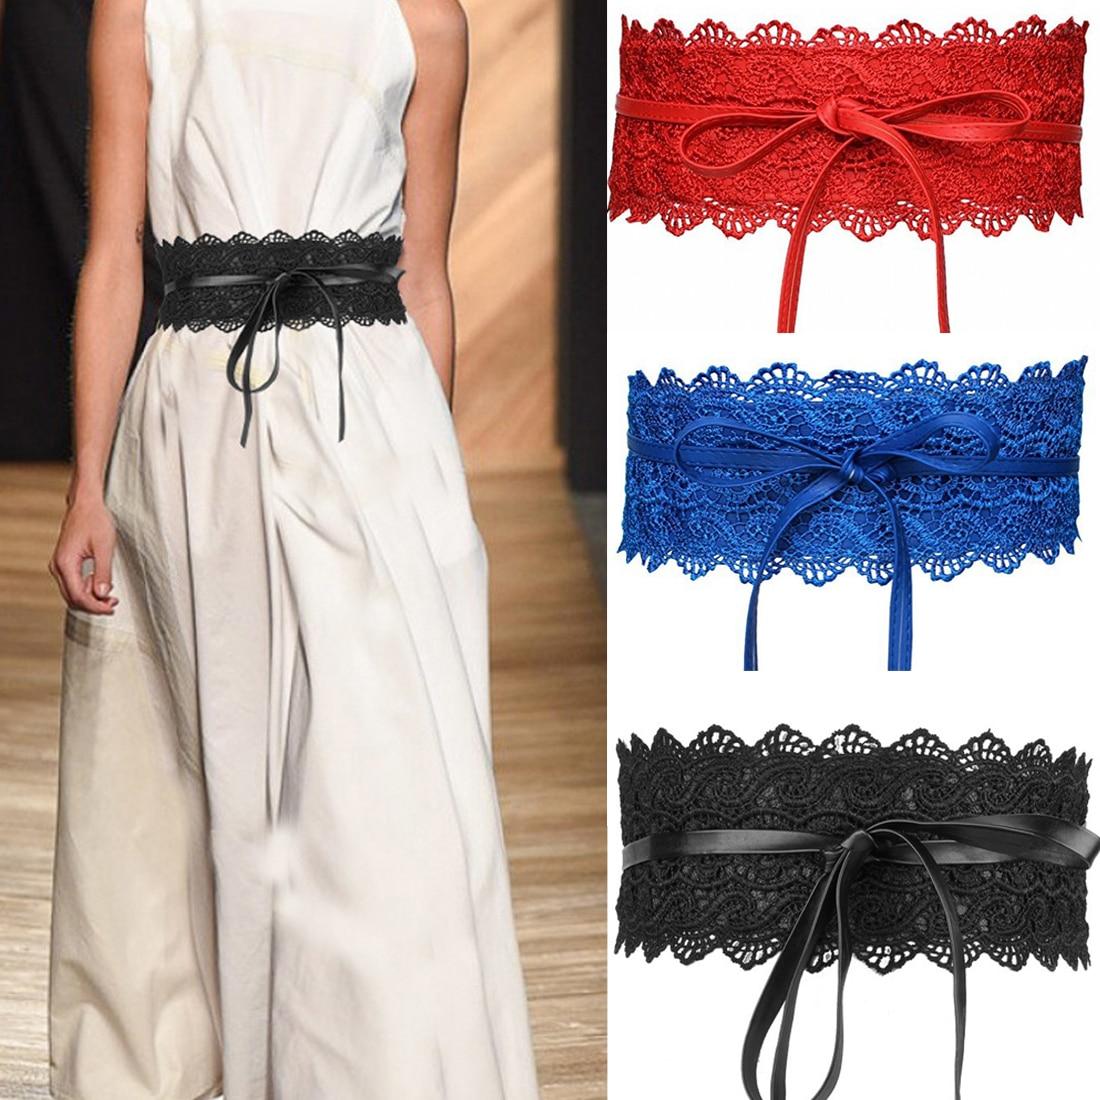 Fashion Women Dress Bowknot Faux Leather Lace Wide Decor Belt Elastic Girdle Waist Band Sweet Solid Belt Dress Accessory